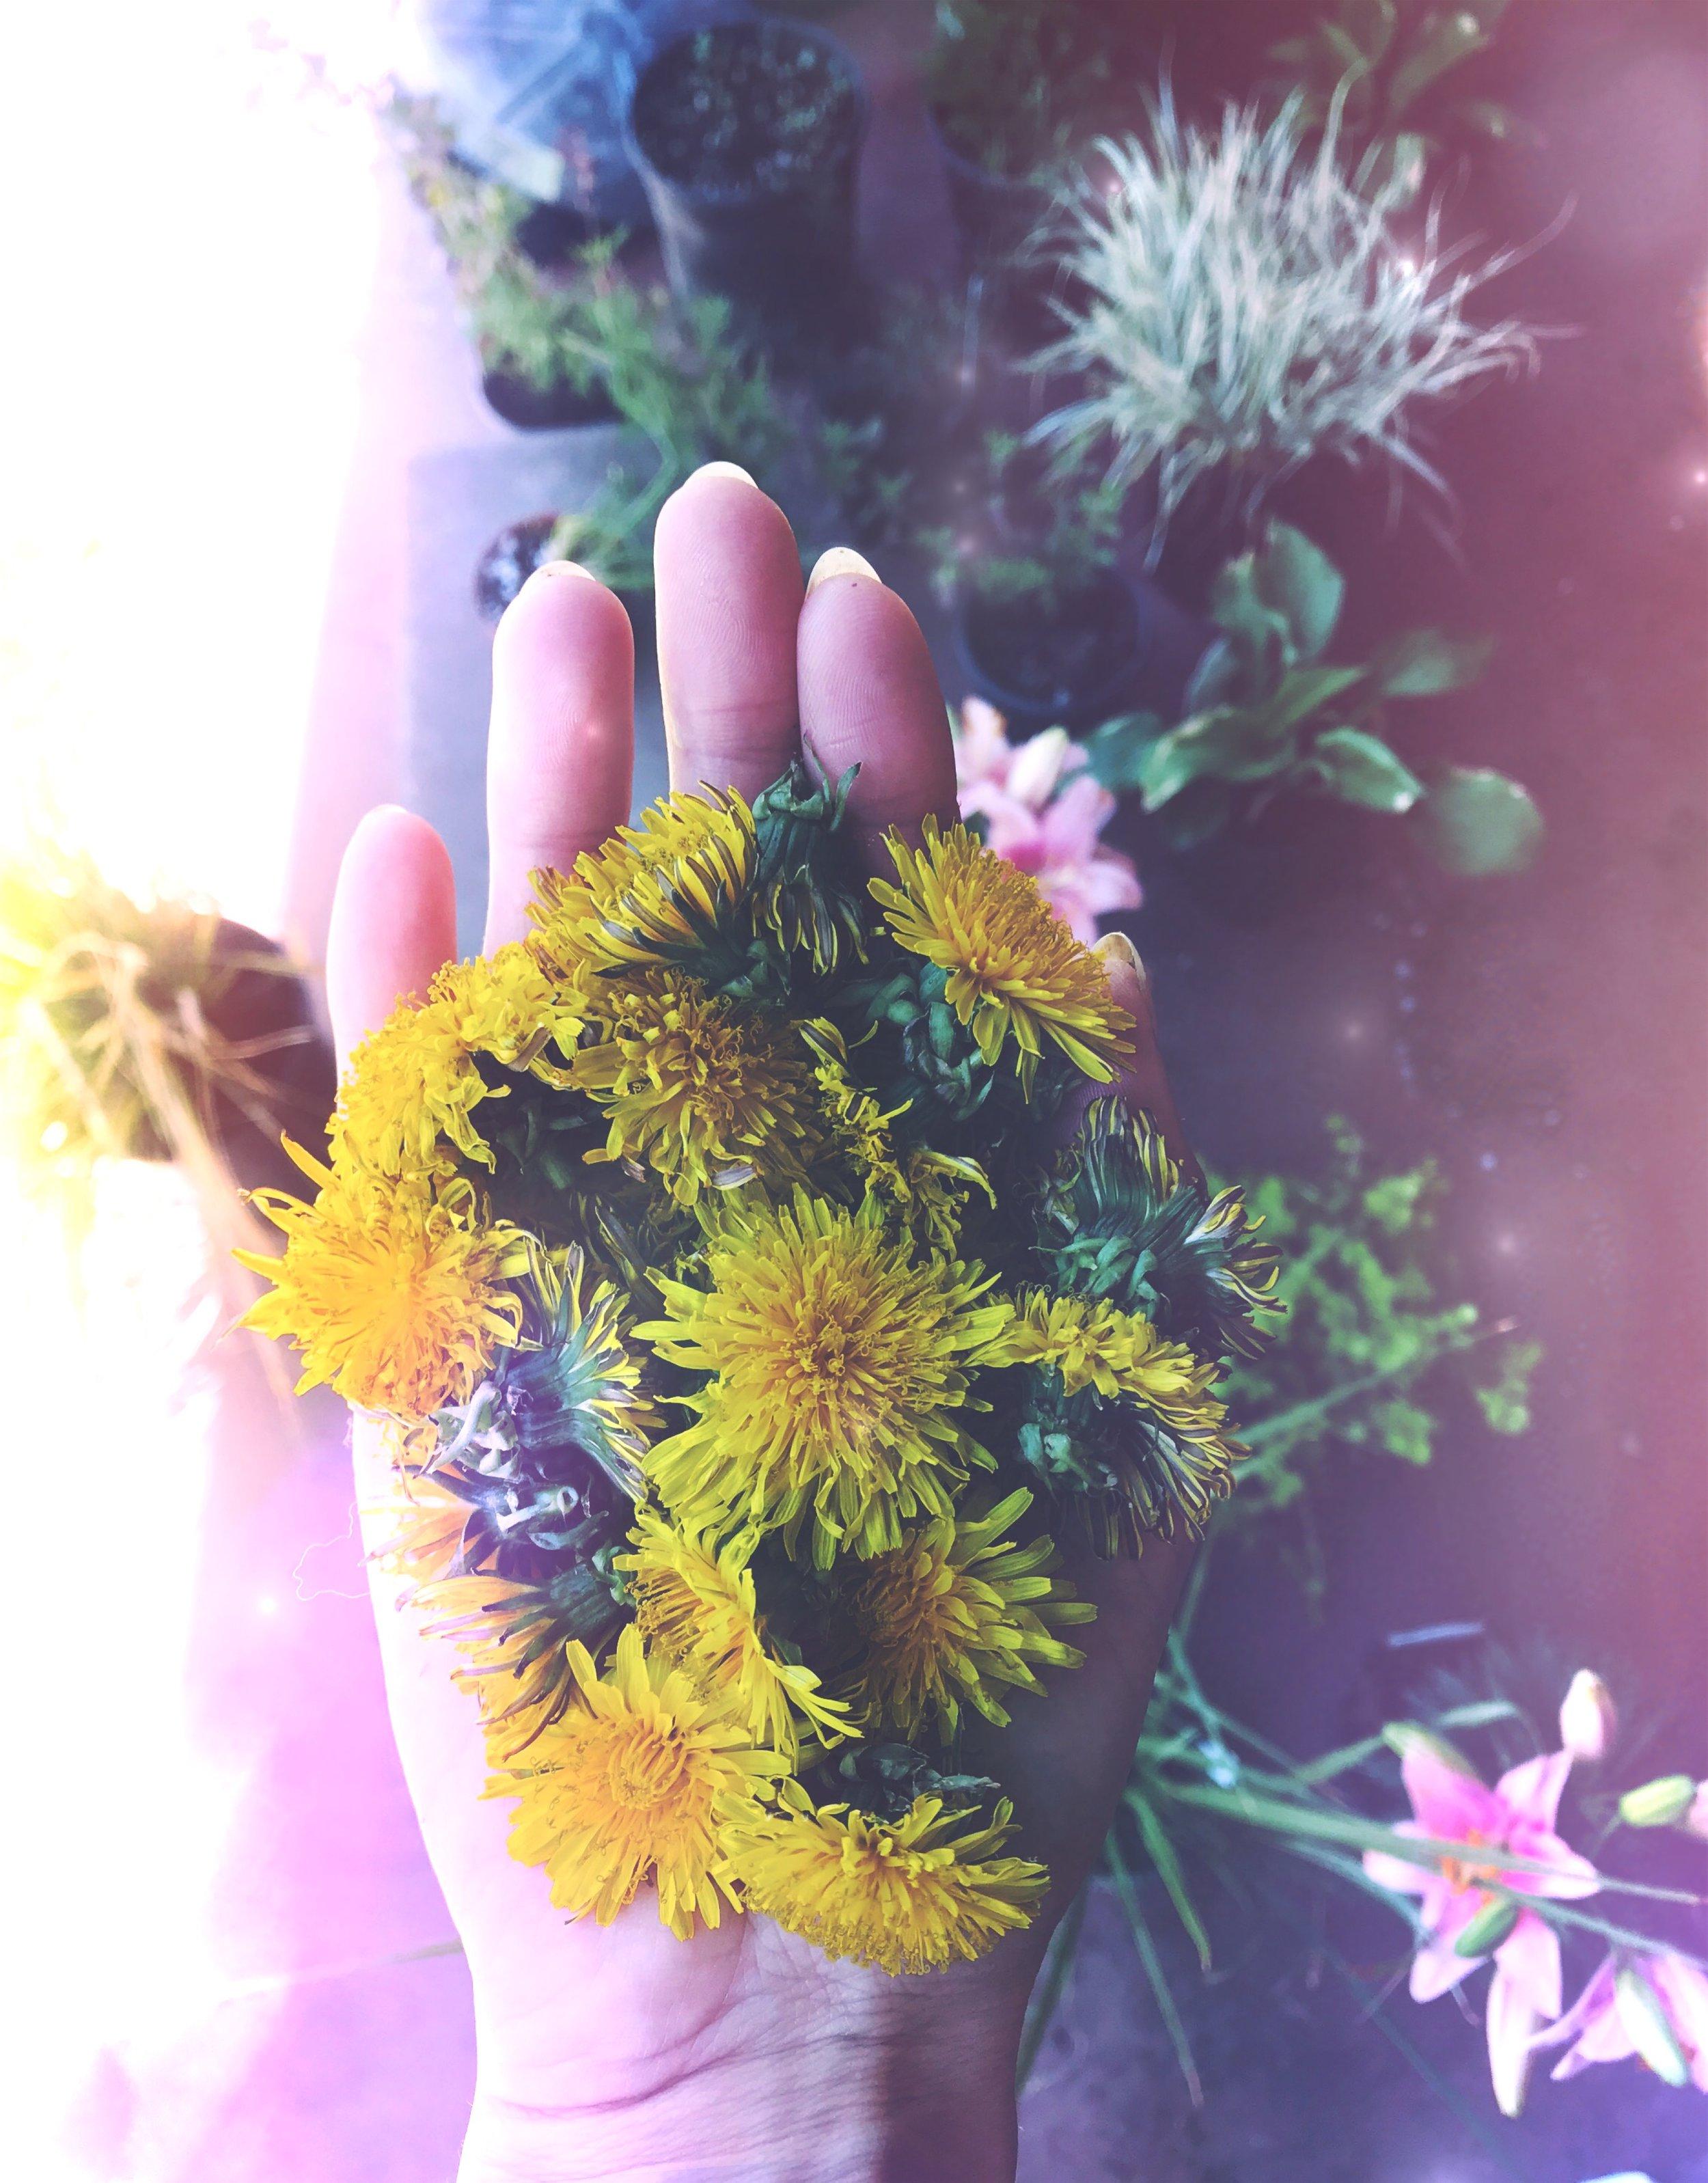 Dandelion Divination and Tea Leaf Reading    Full Honey Moon in Sagittarius